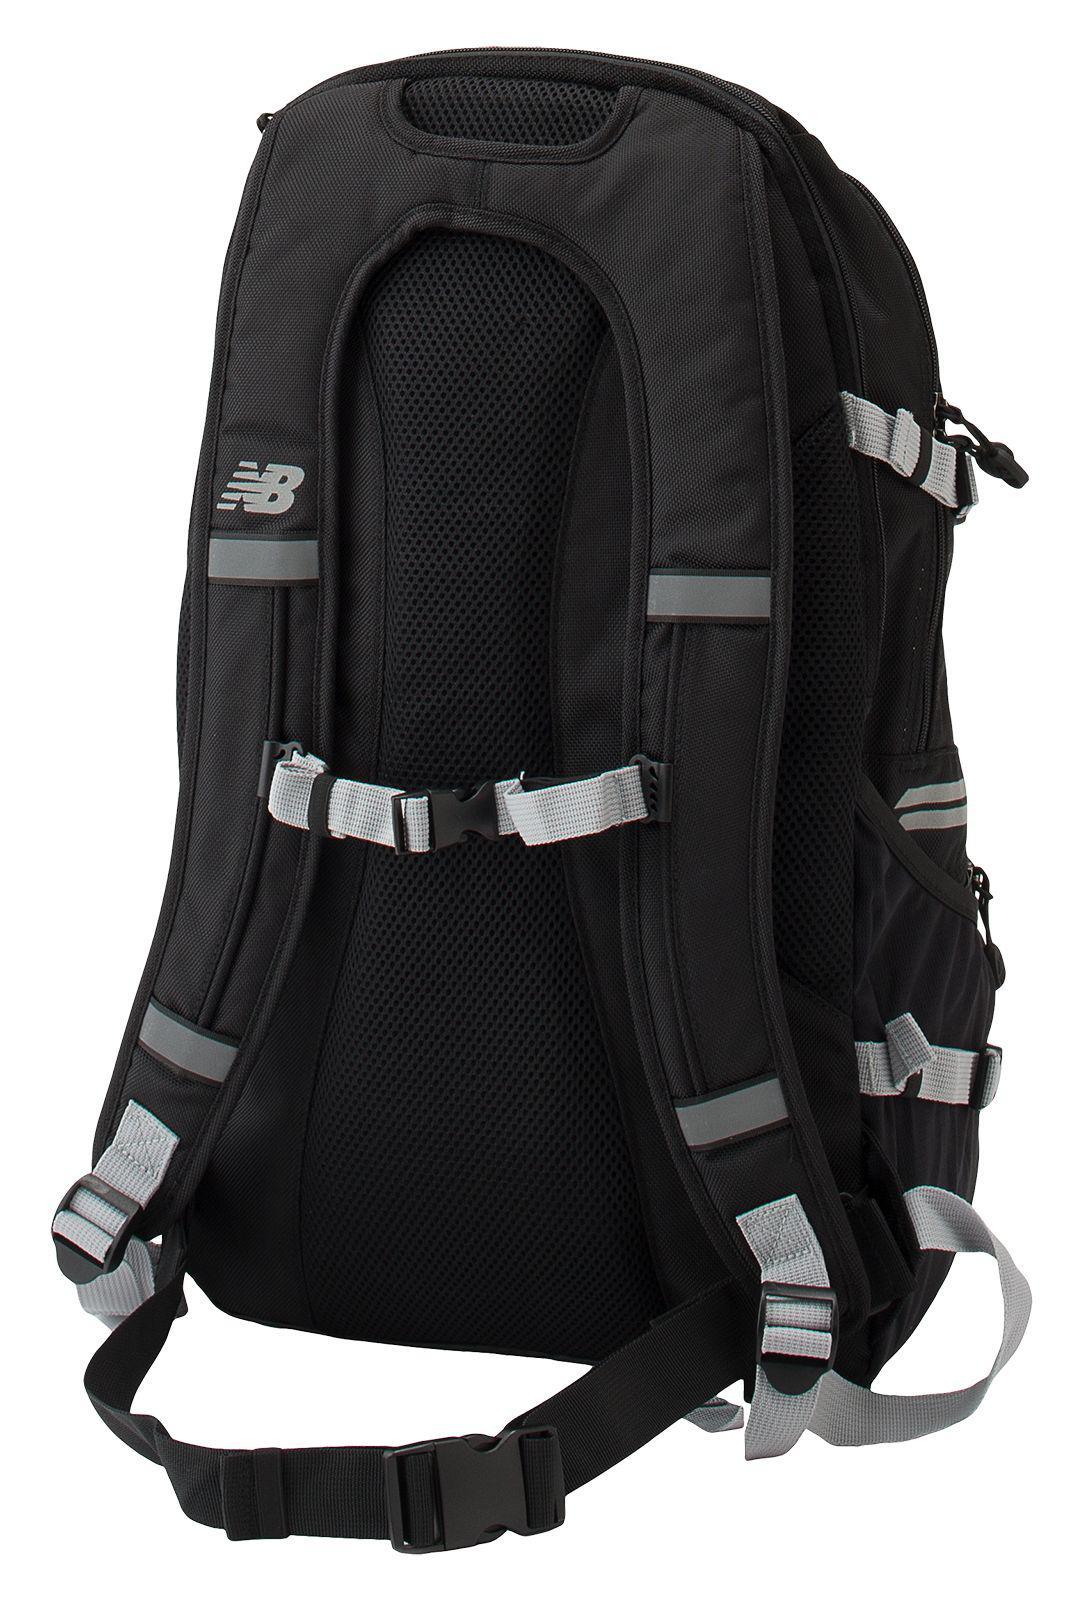 Lyst - New Balance Commuter Backpack V2 in Black for Men a35745ae9c00c